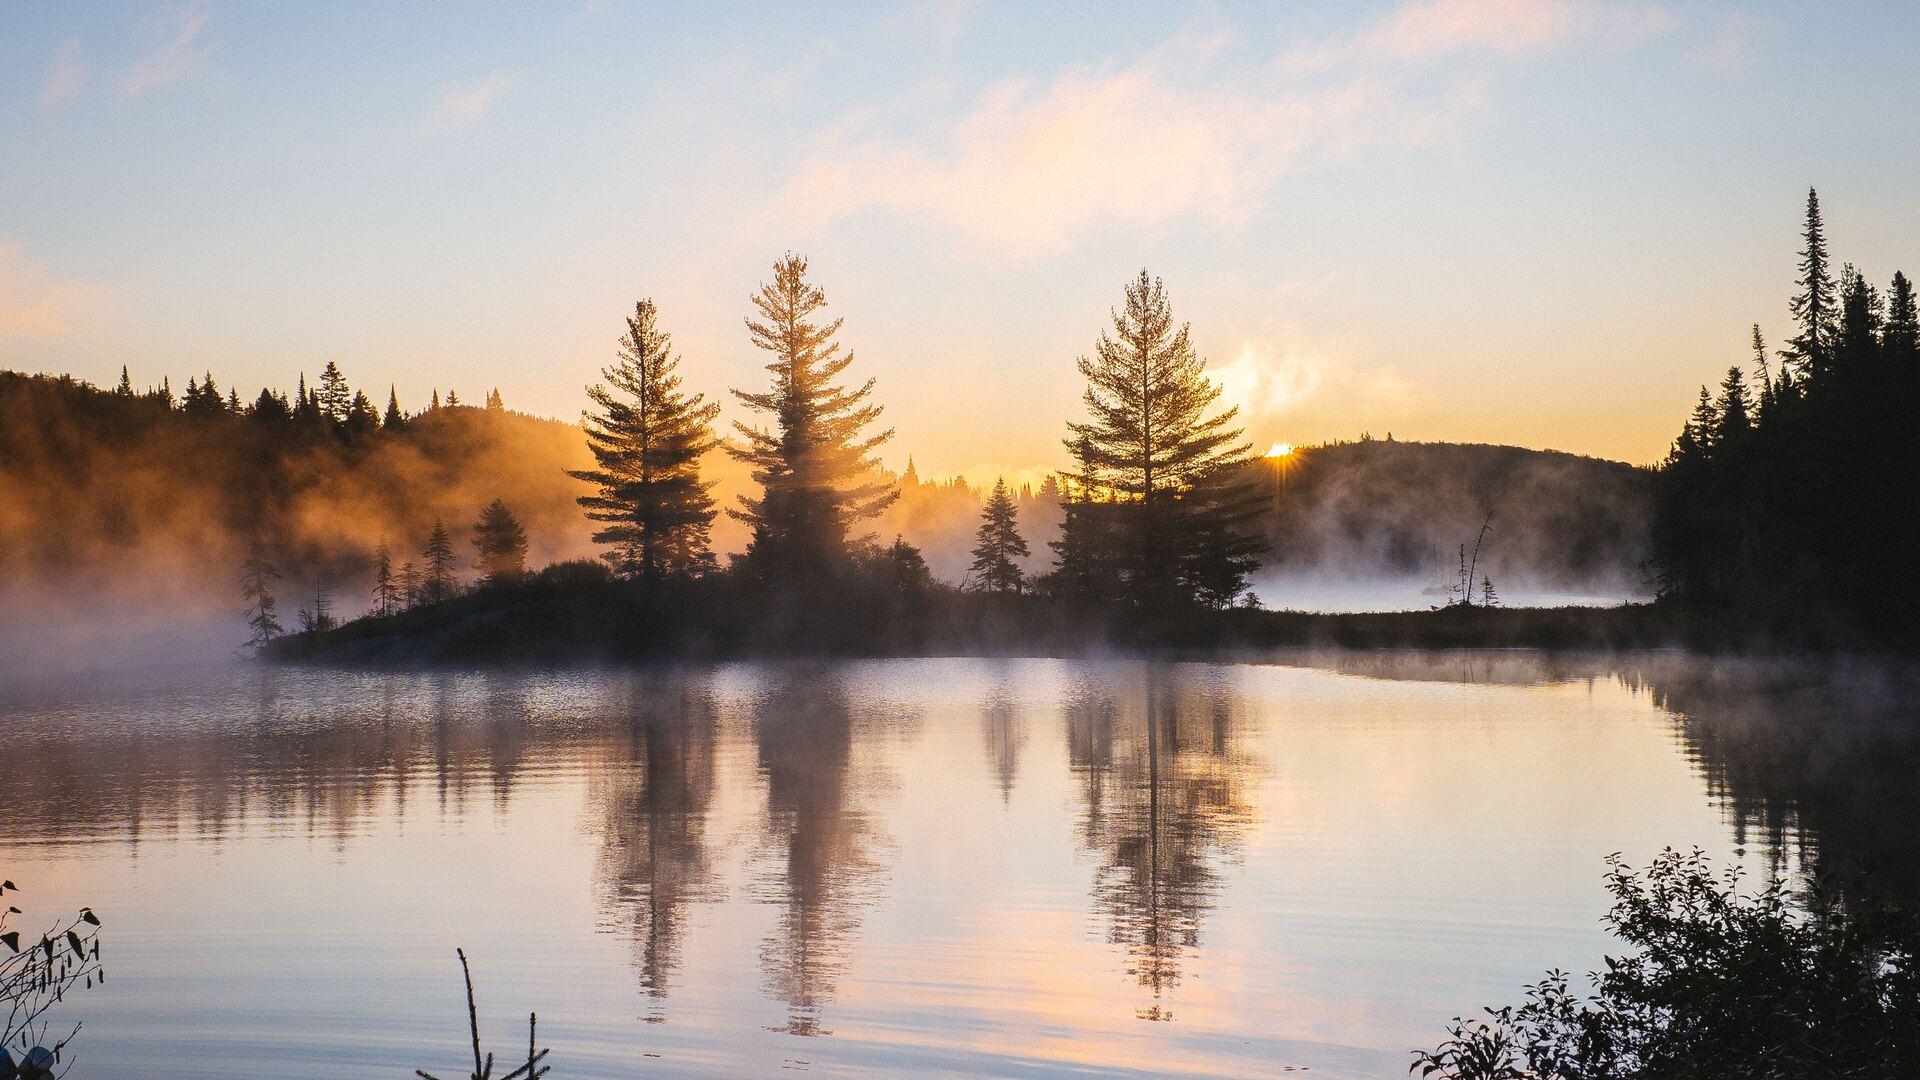 1920x1080 Lake Reflection Morning Mist Trees Nature Hd 4k ...